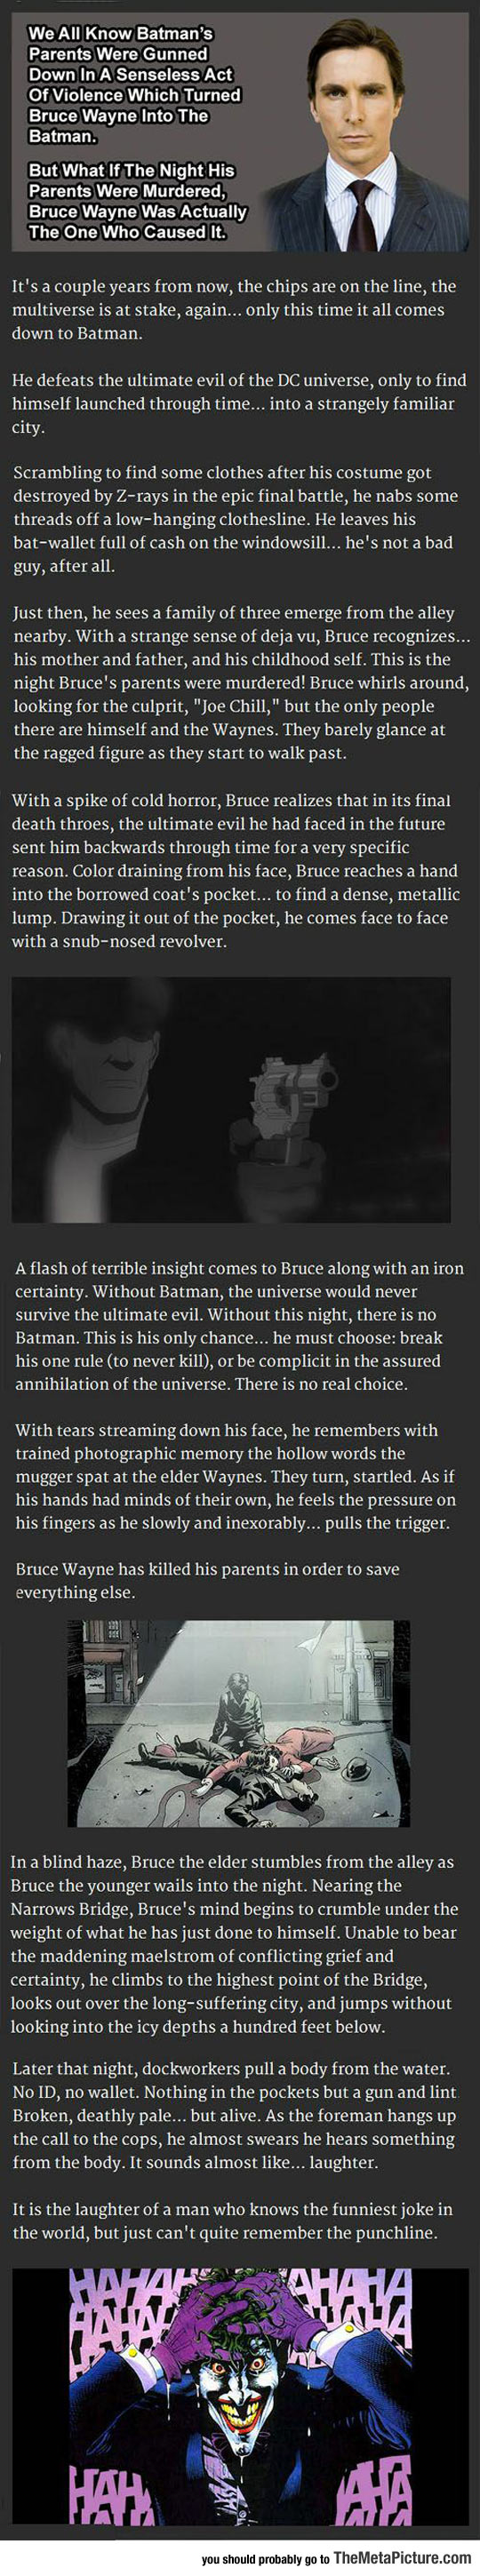 funny-Batman-theory-Joker